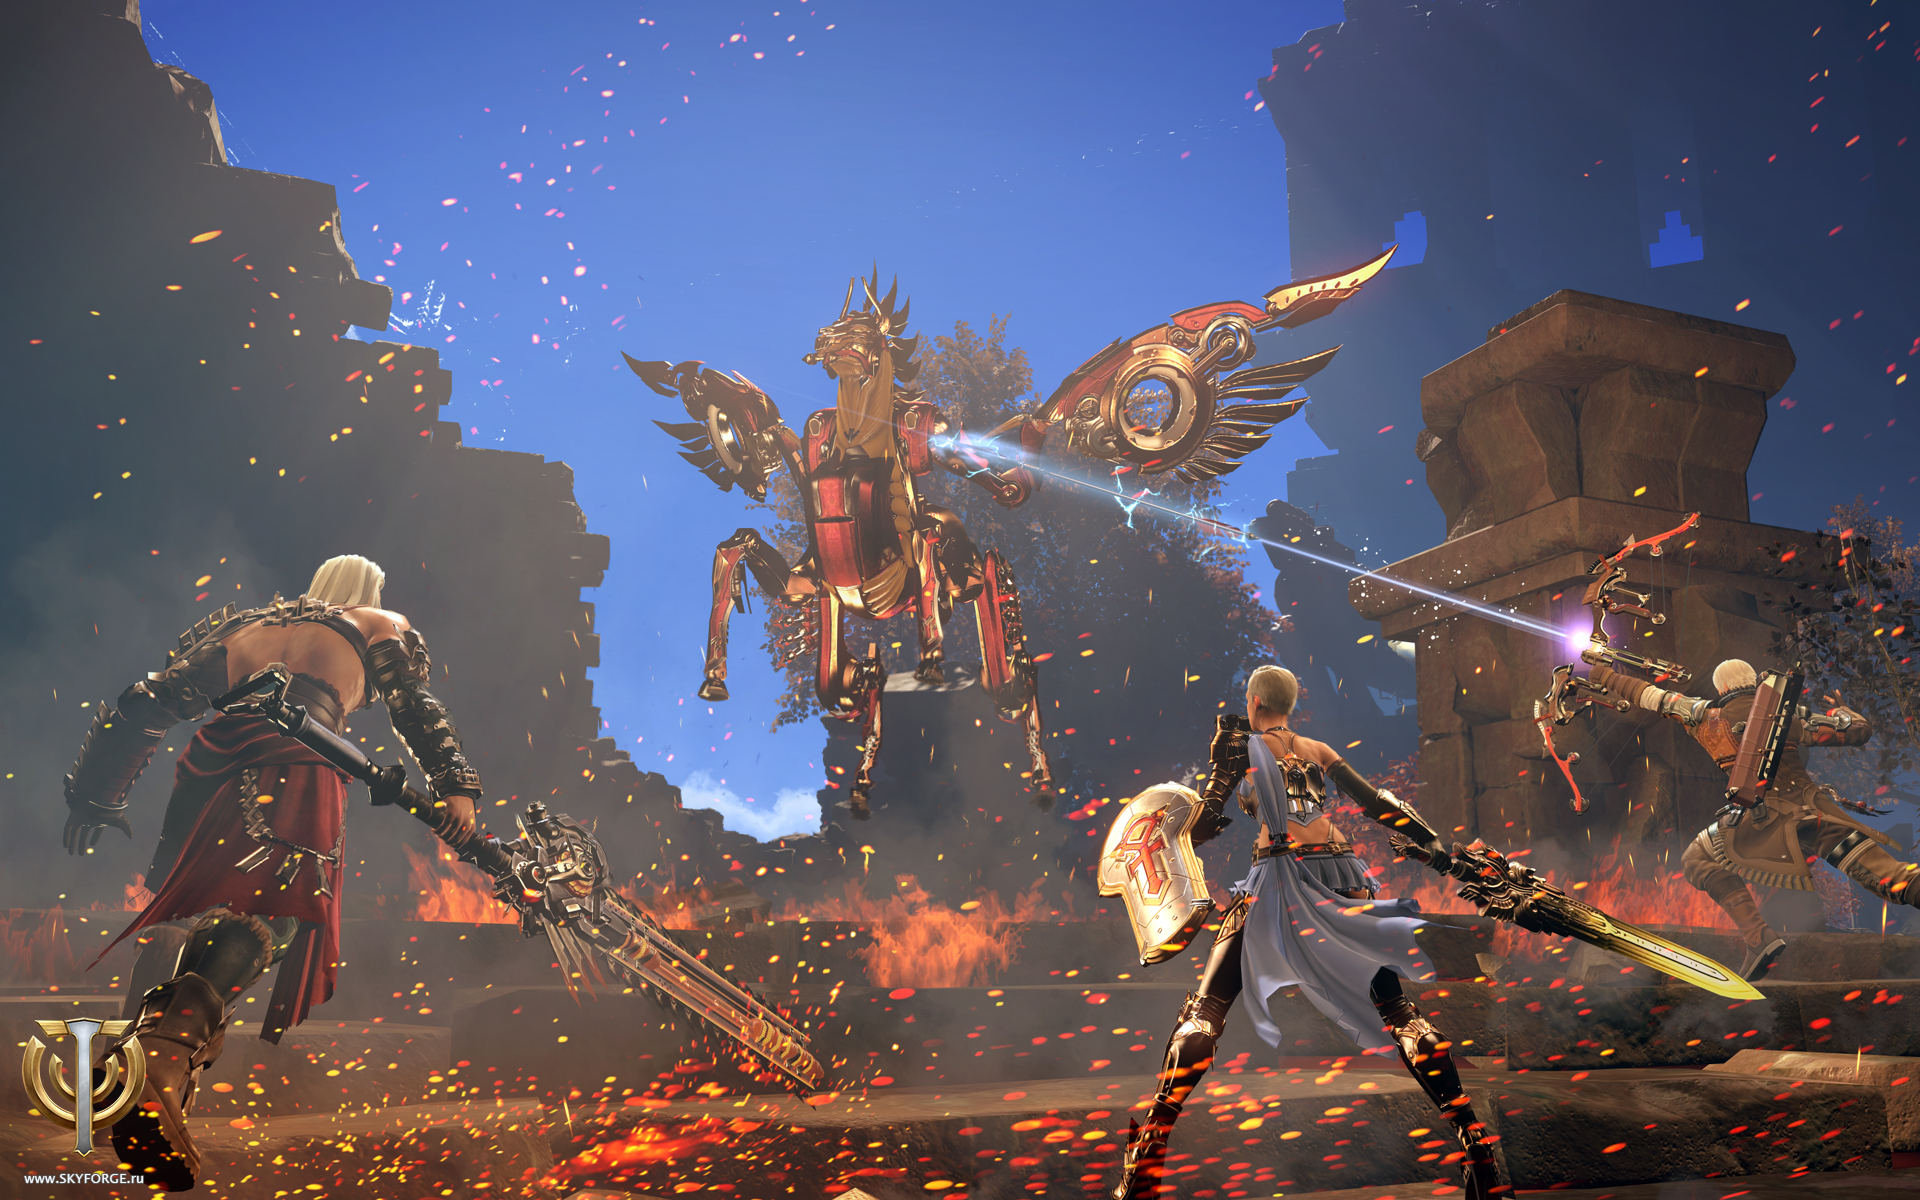 Бесплатная MMORPG Skyforge была анонсирована для Nintendo Switch